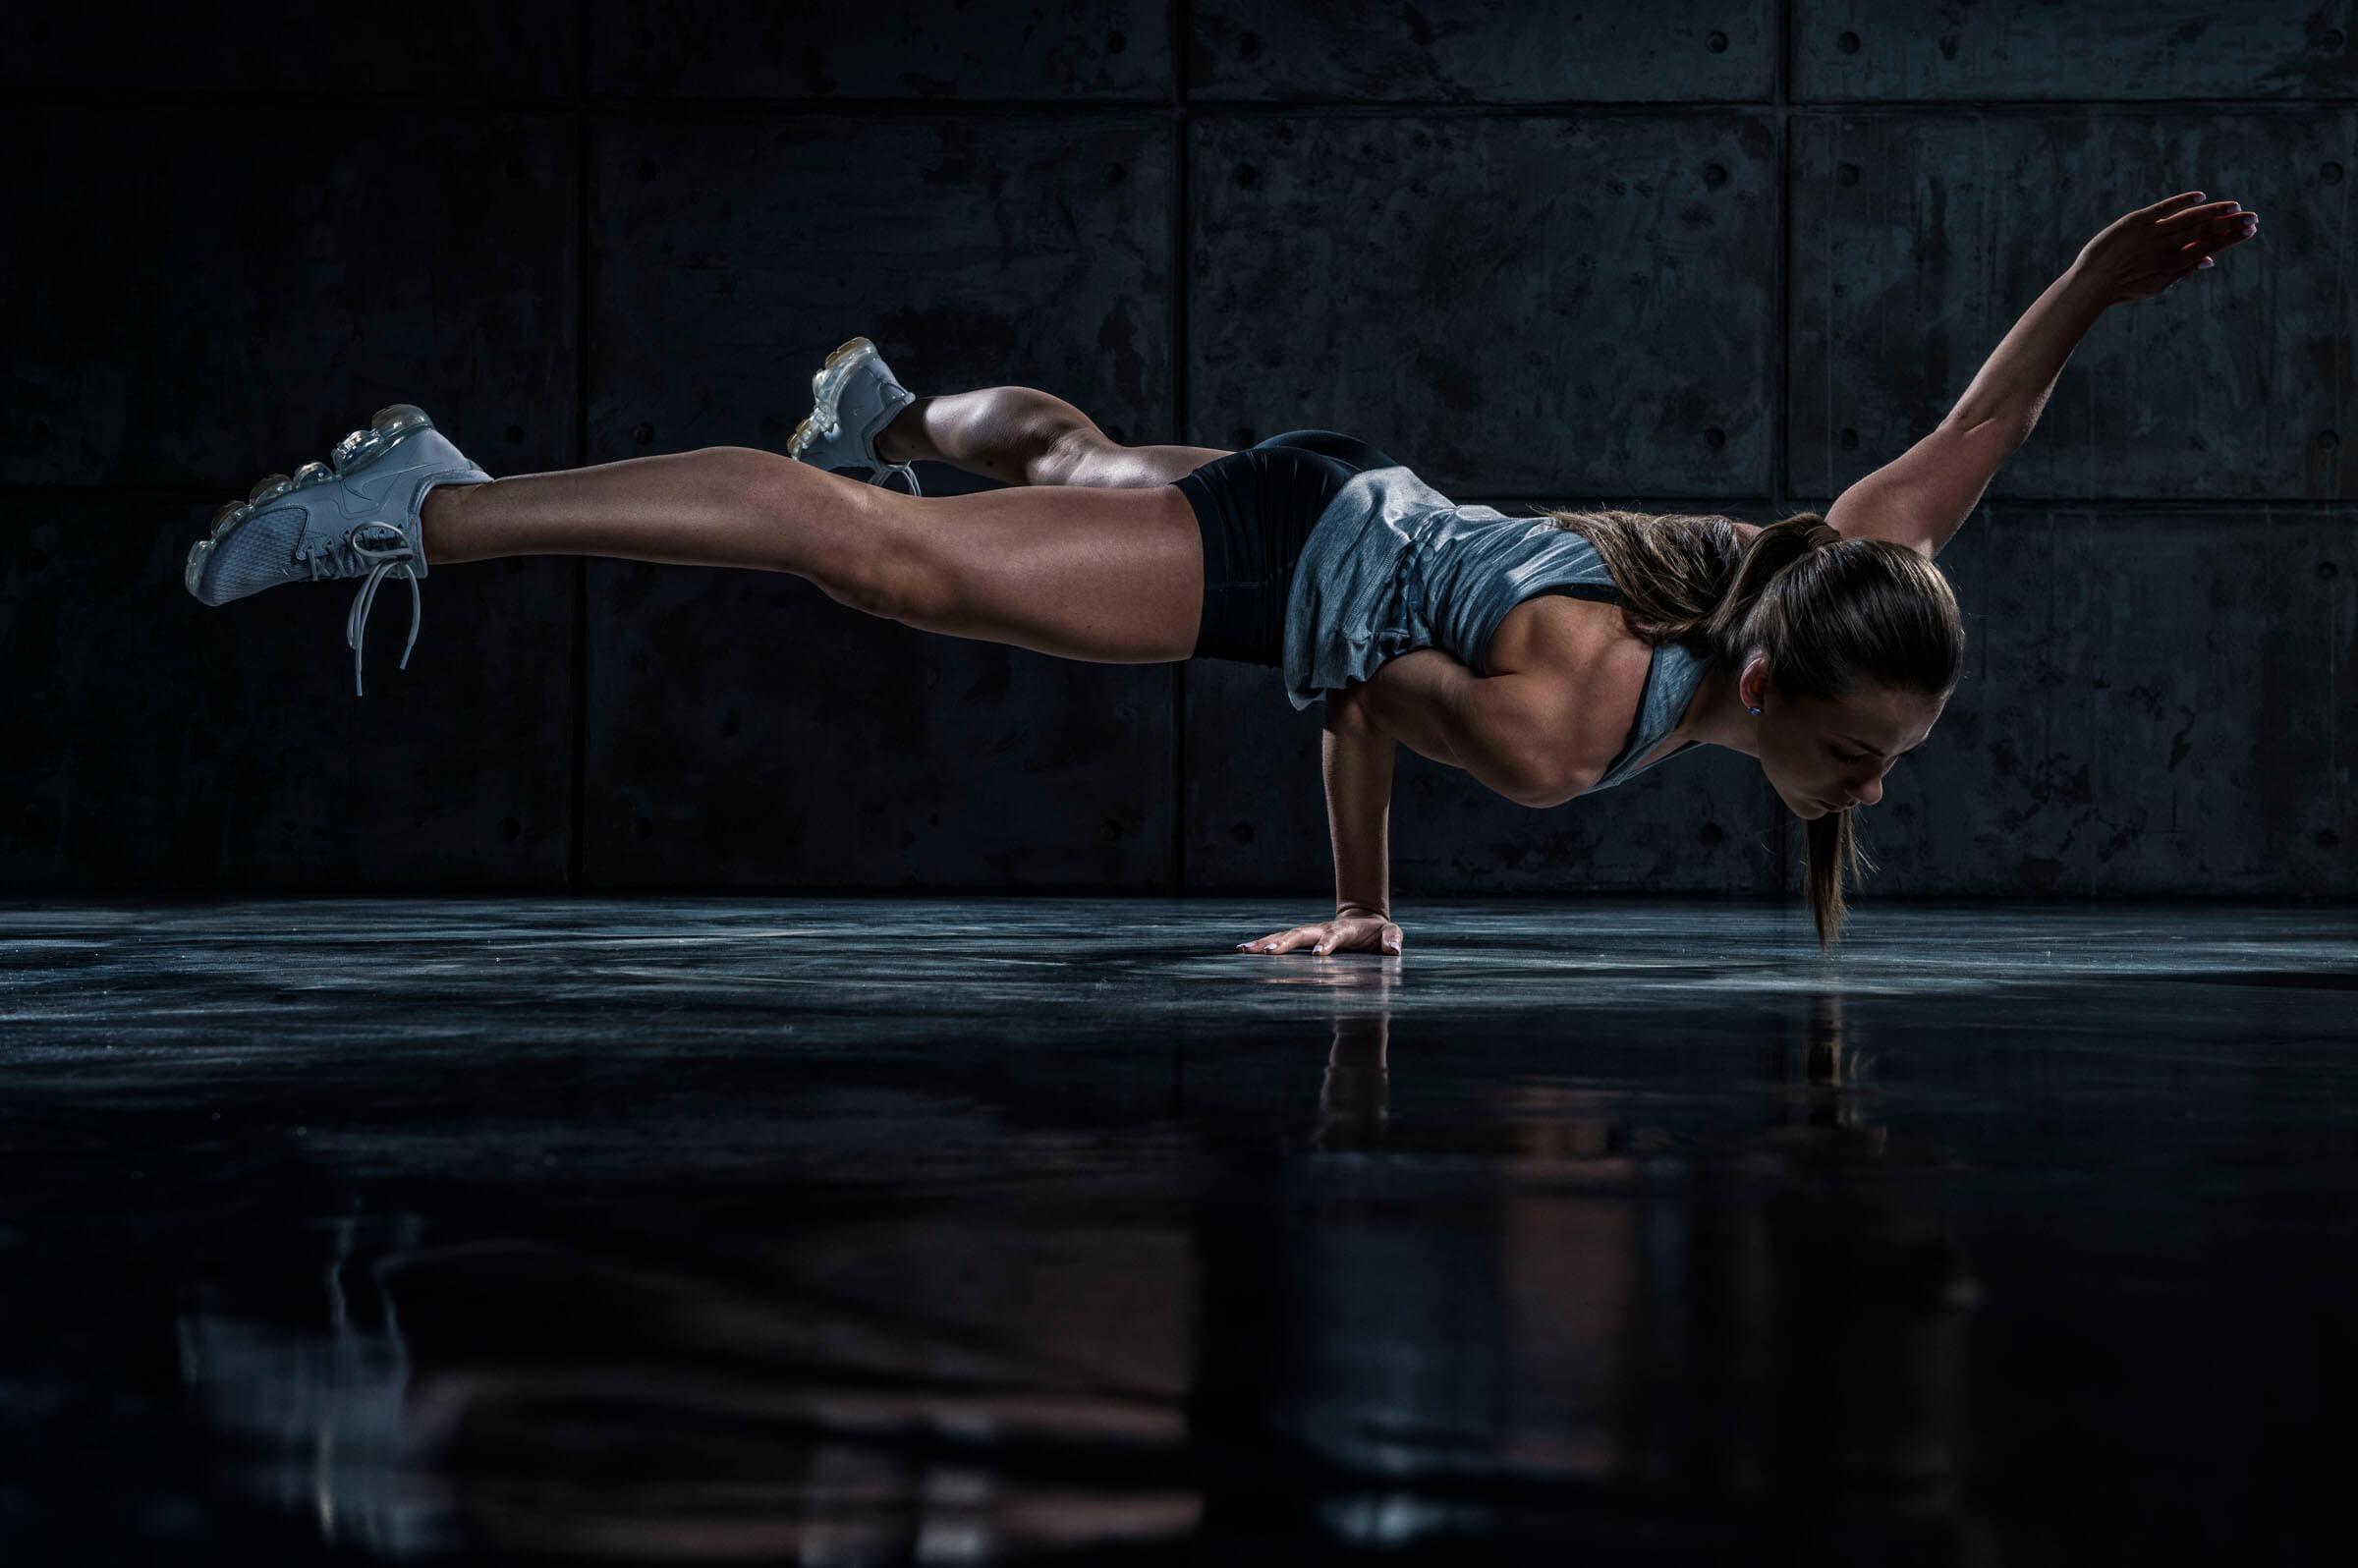 foto Daniel Vojtech / Red Bull Content Pool